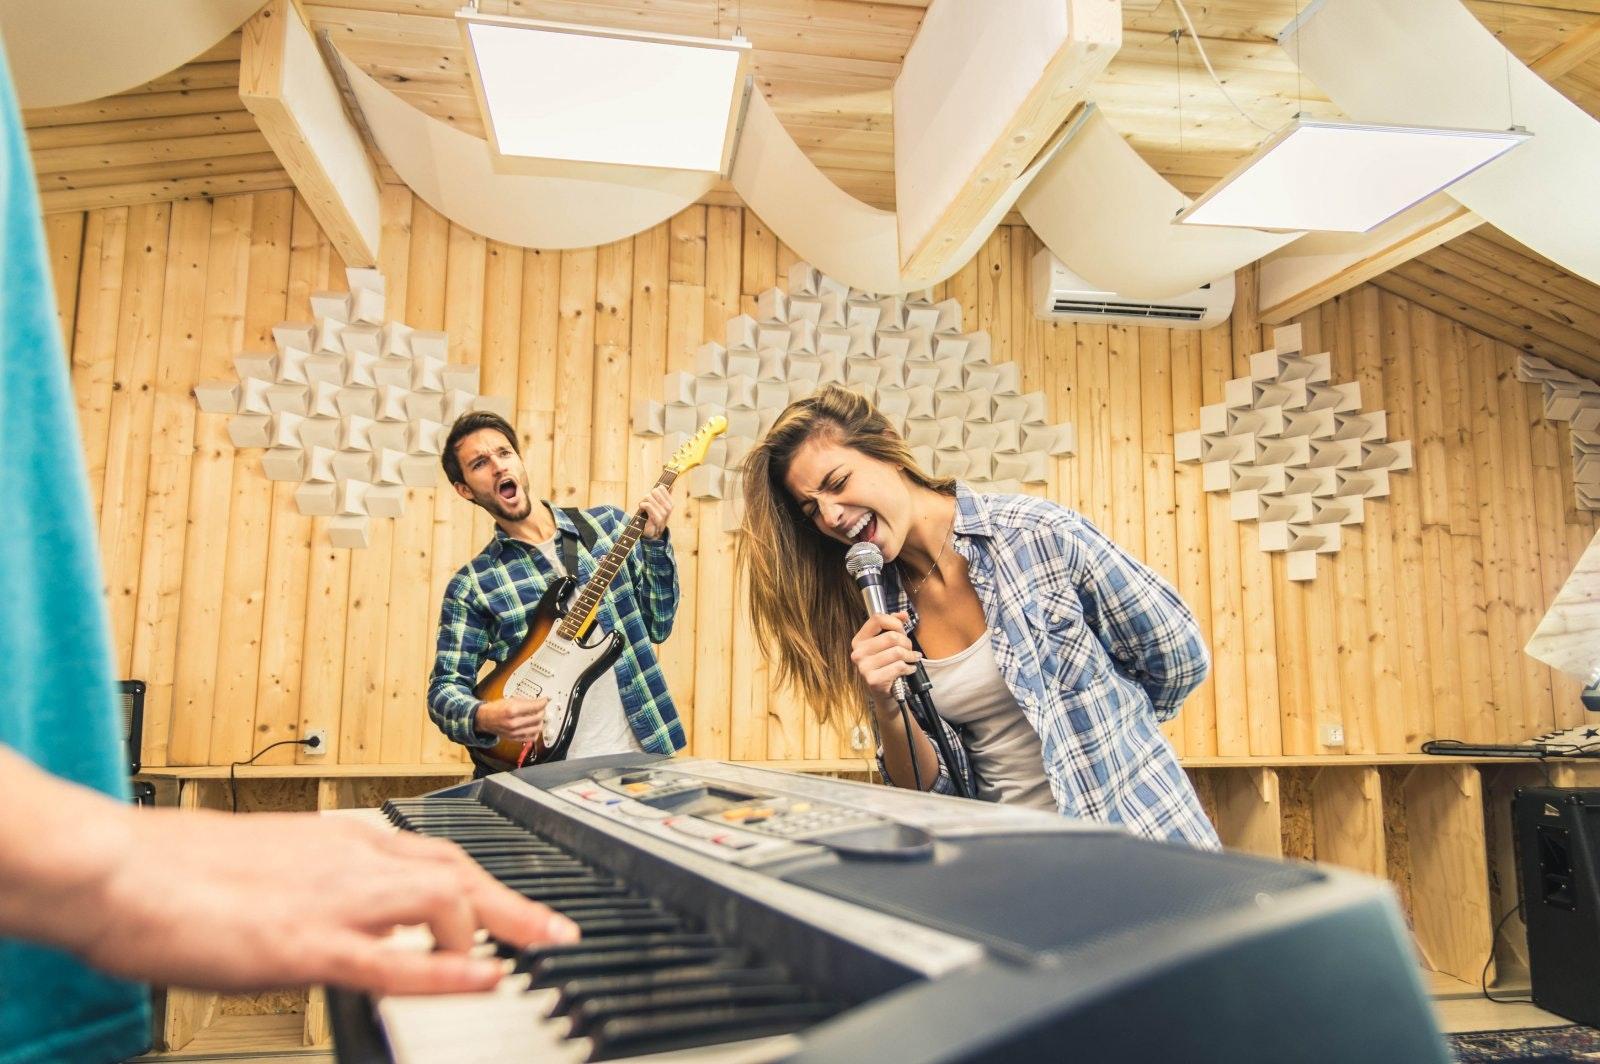 duo-gitarre-sängerin-piano-buchen